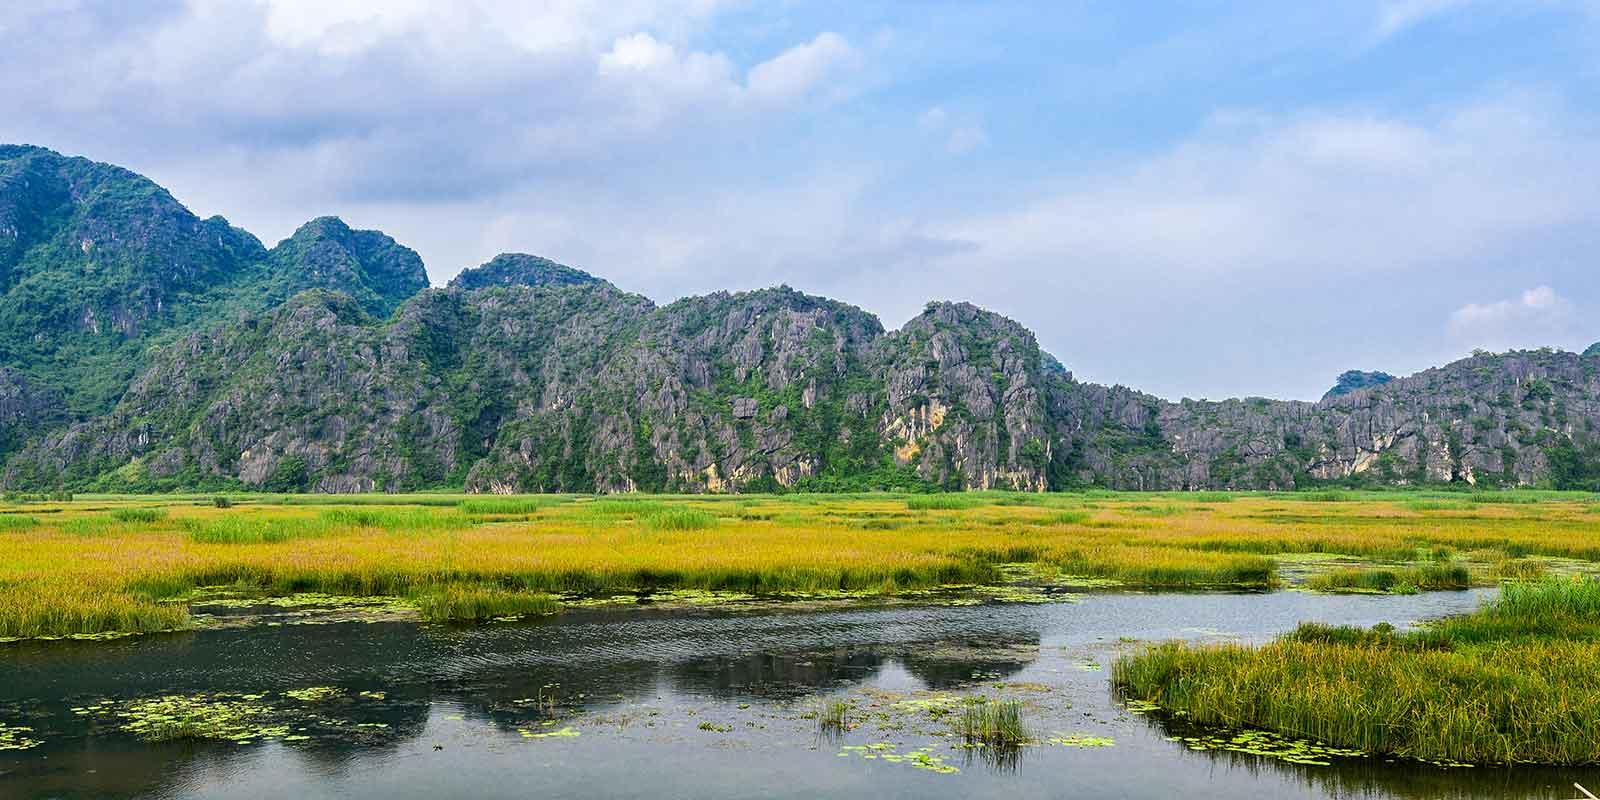 Mountain and lake scenery at Van Long Nature Reserve in Vietnam